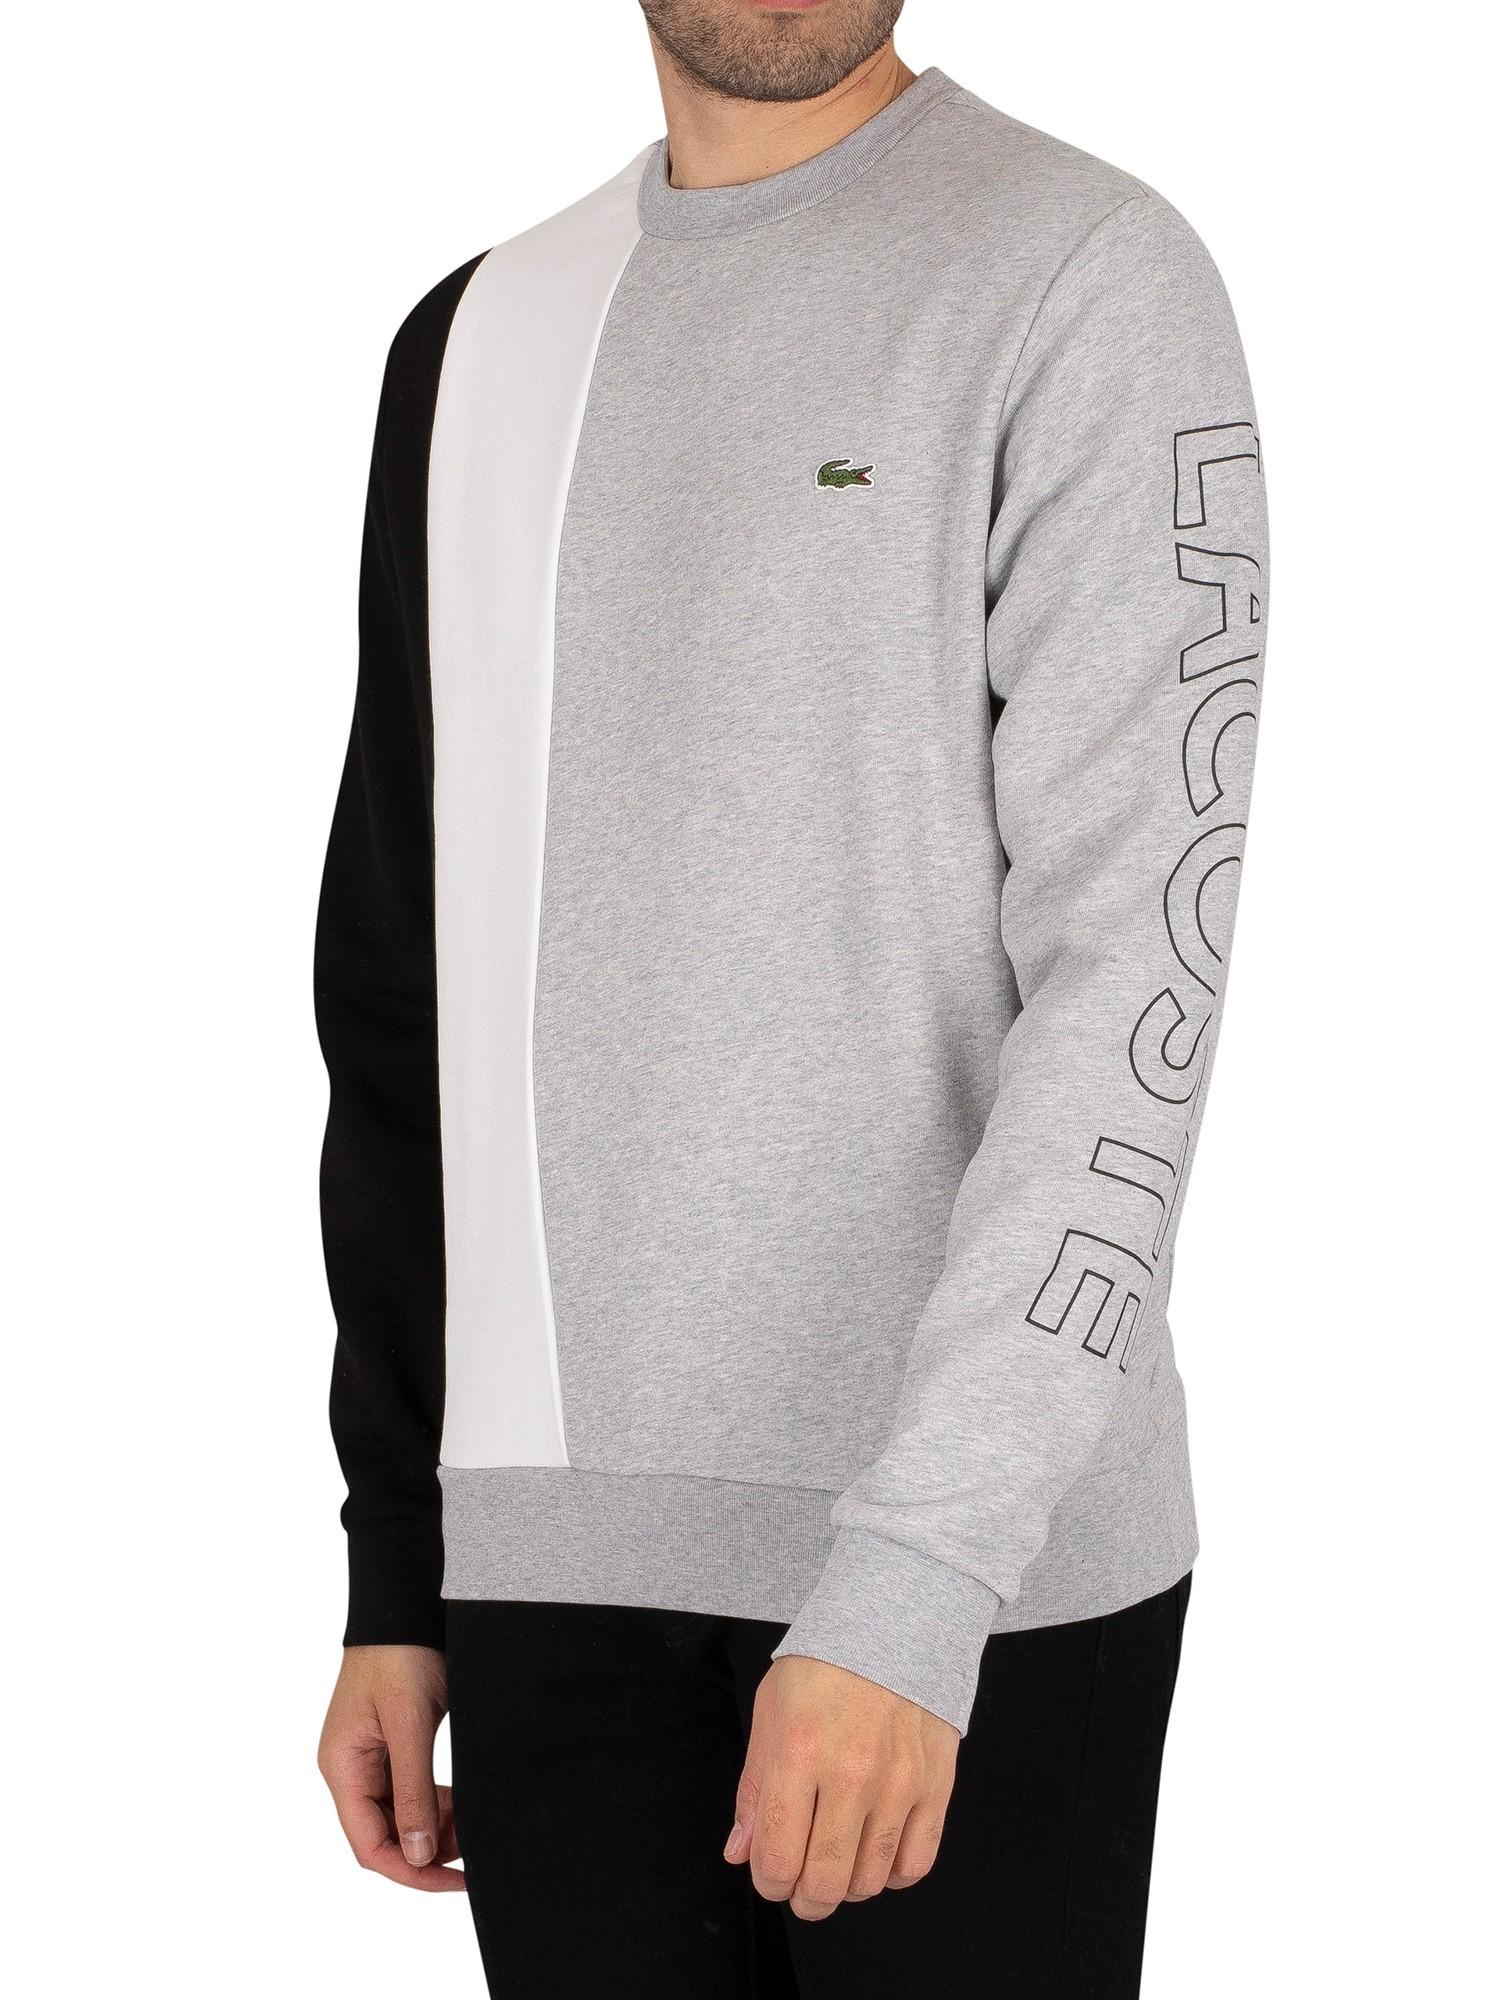 Lettered Colourblock Fleece Sweatshirt